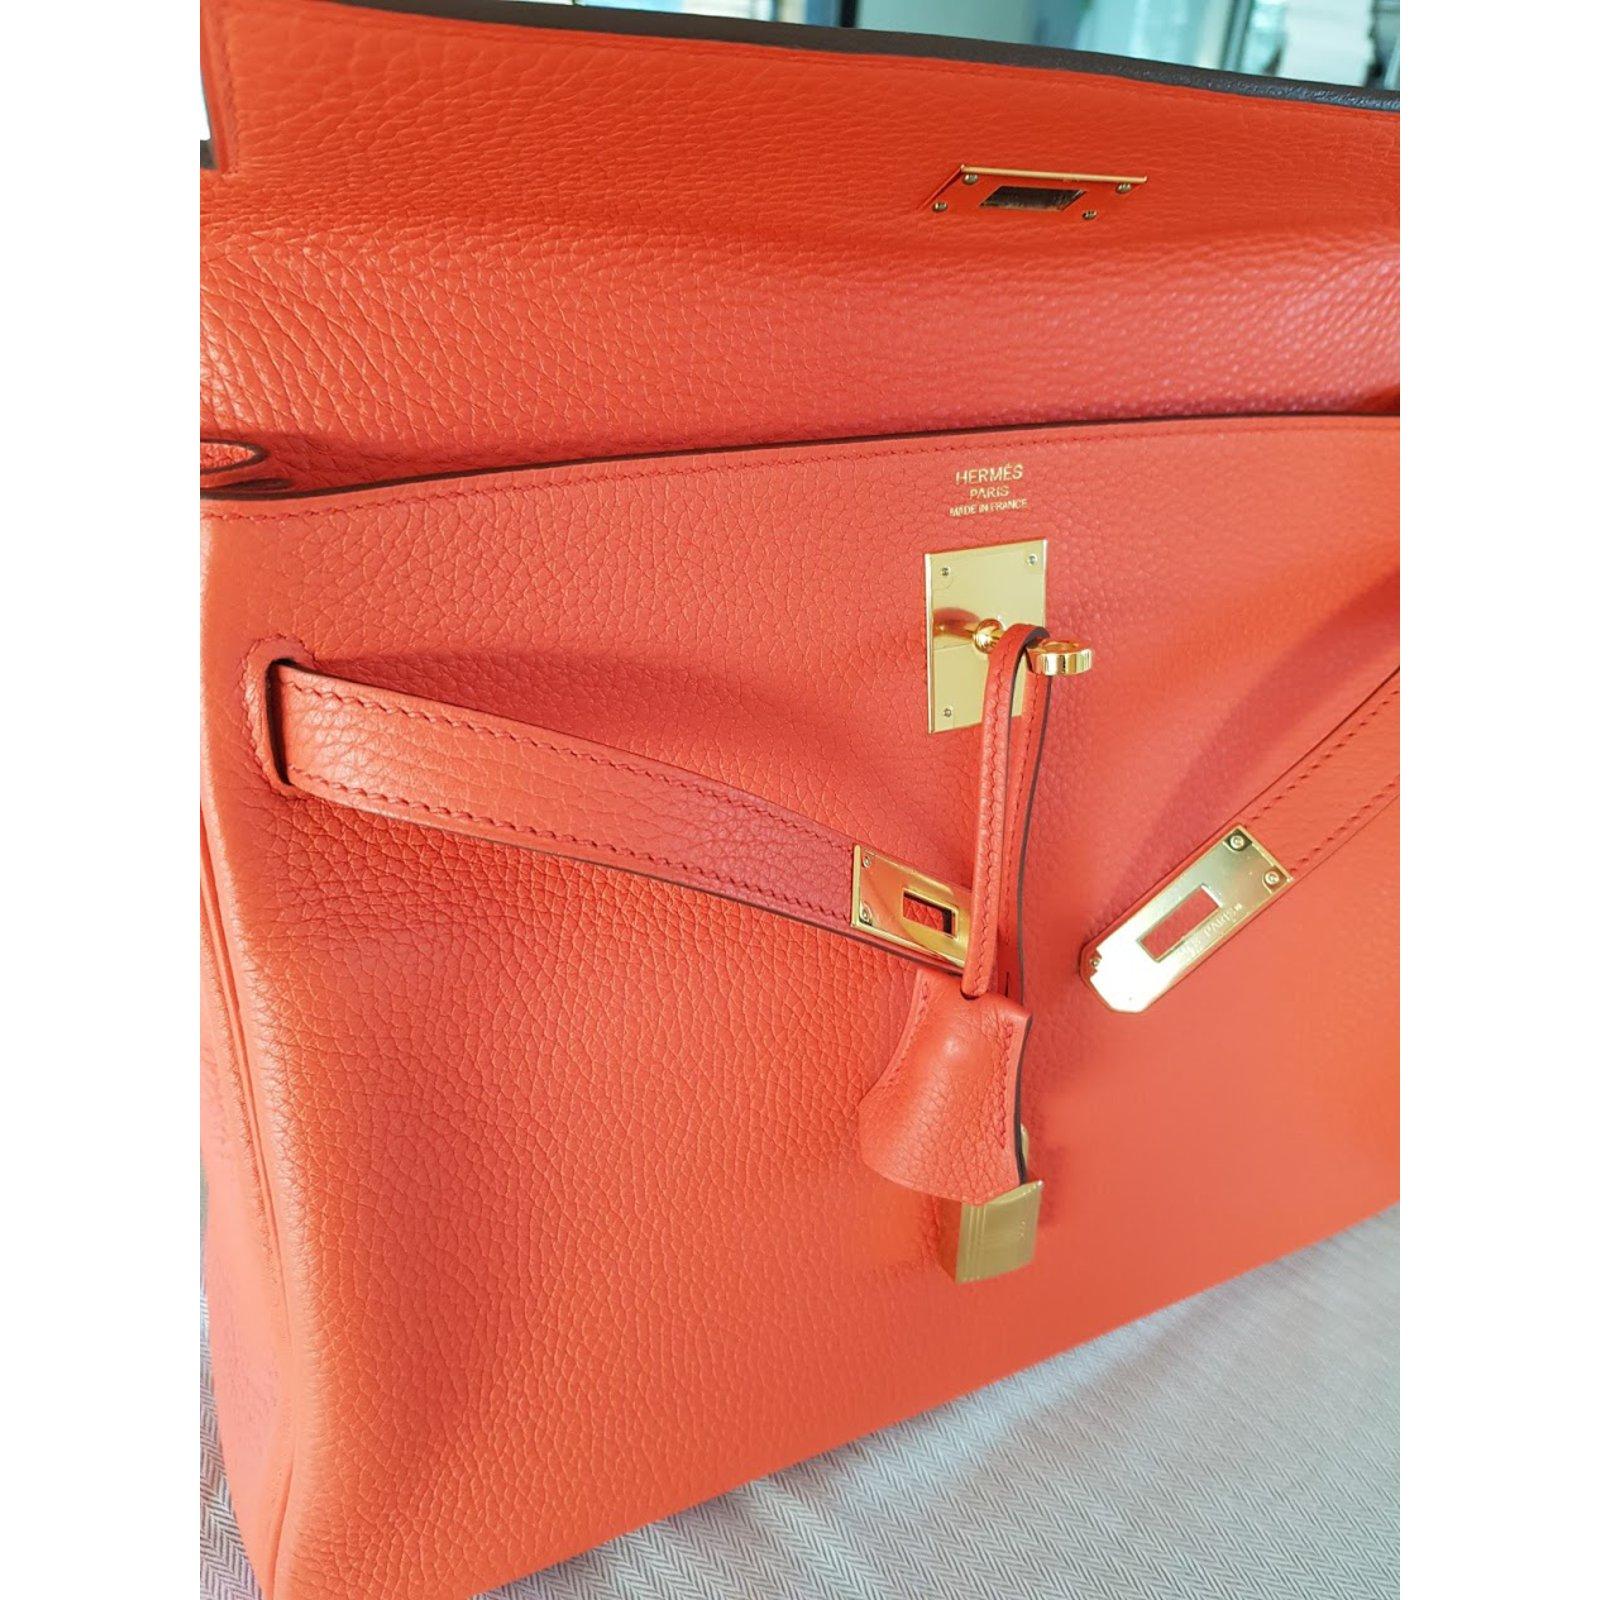 942b297f573d ... promo code for hermès kelly 32 orange poppy handbags leather other  ref.55688 joli closet